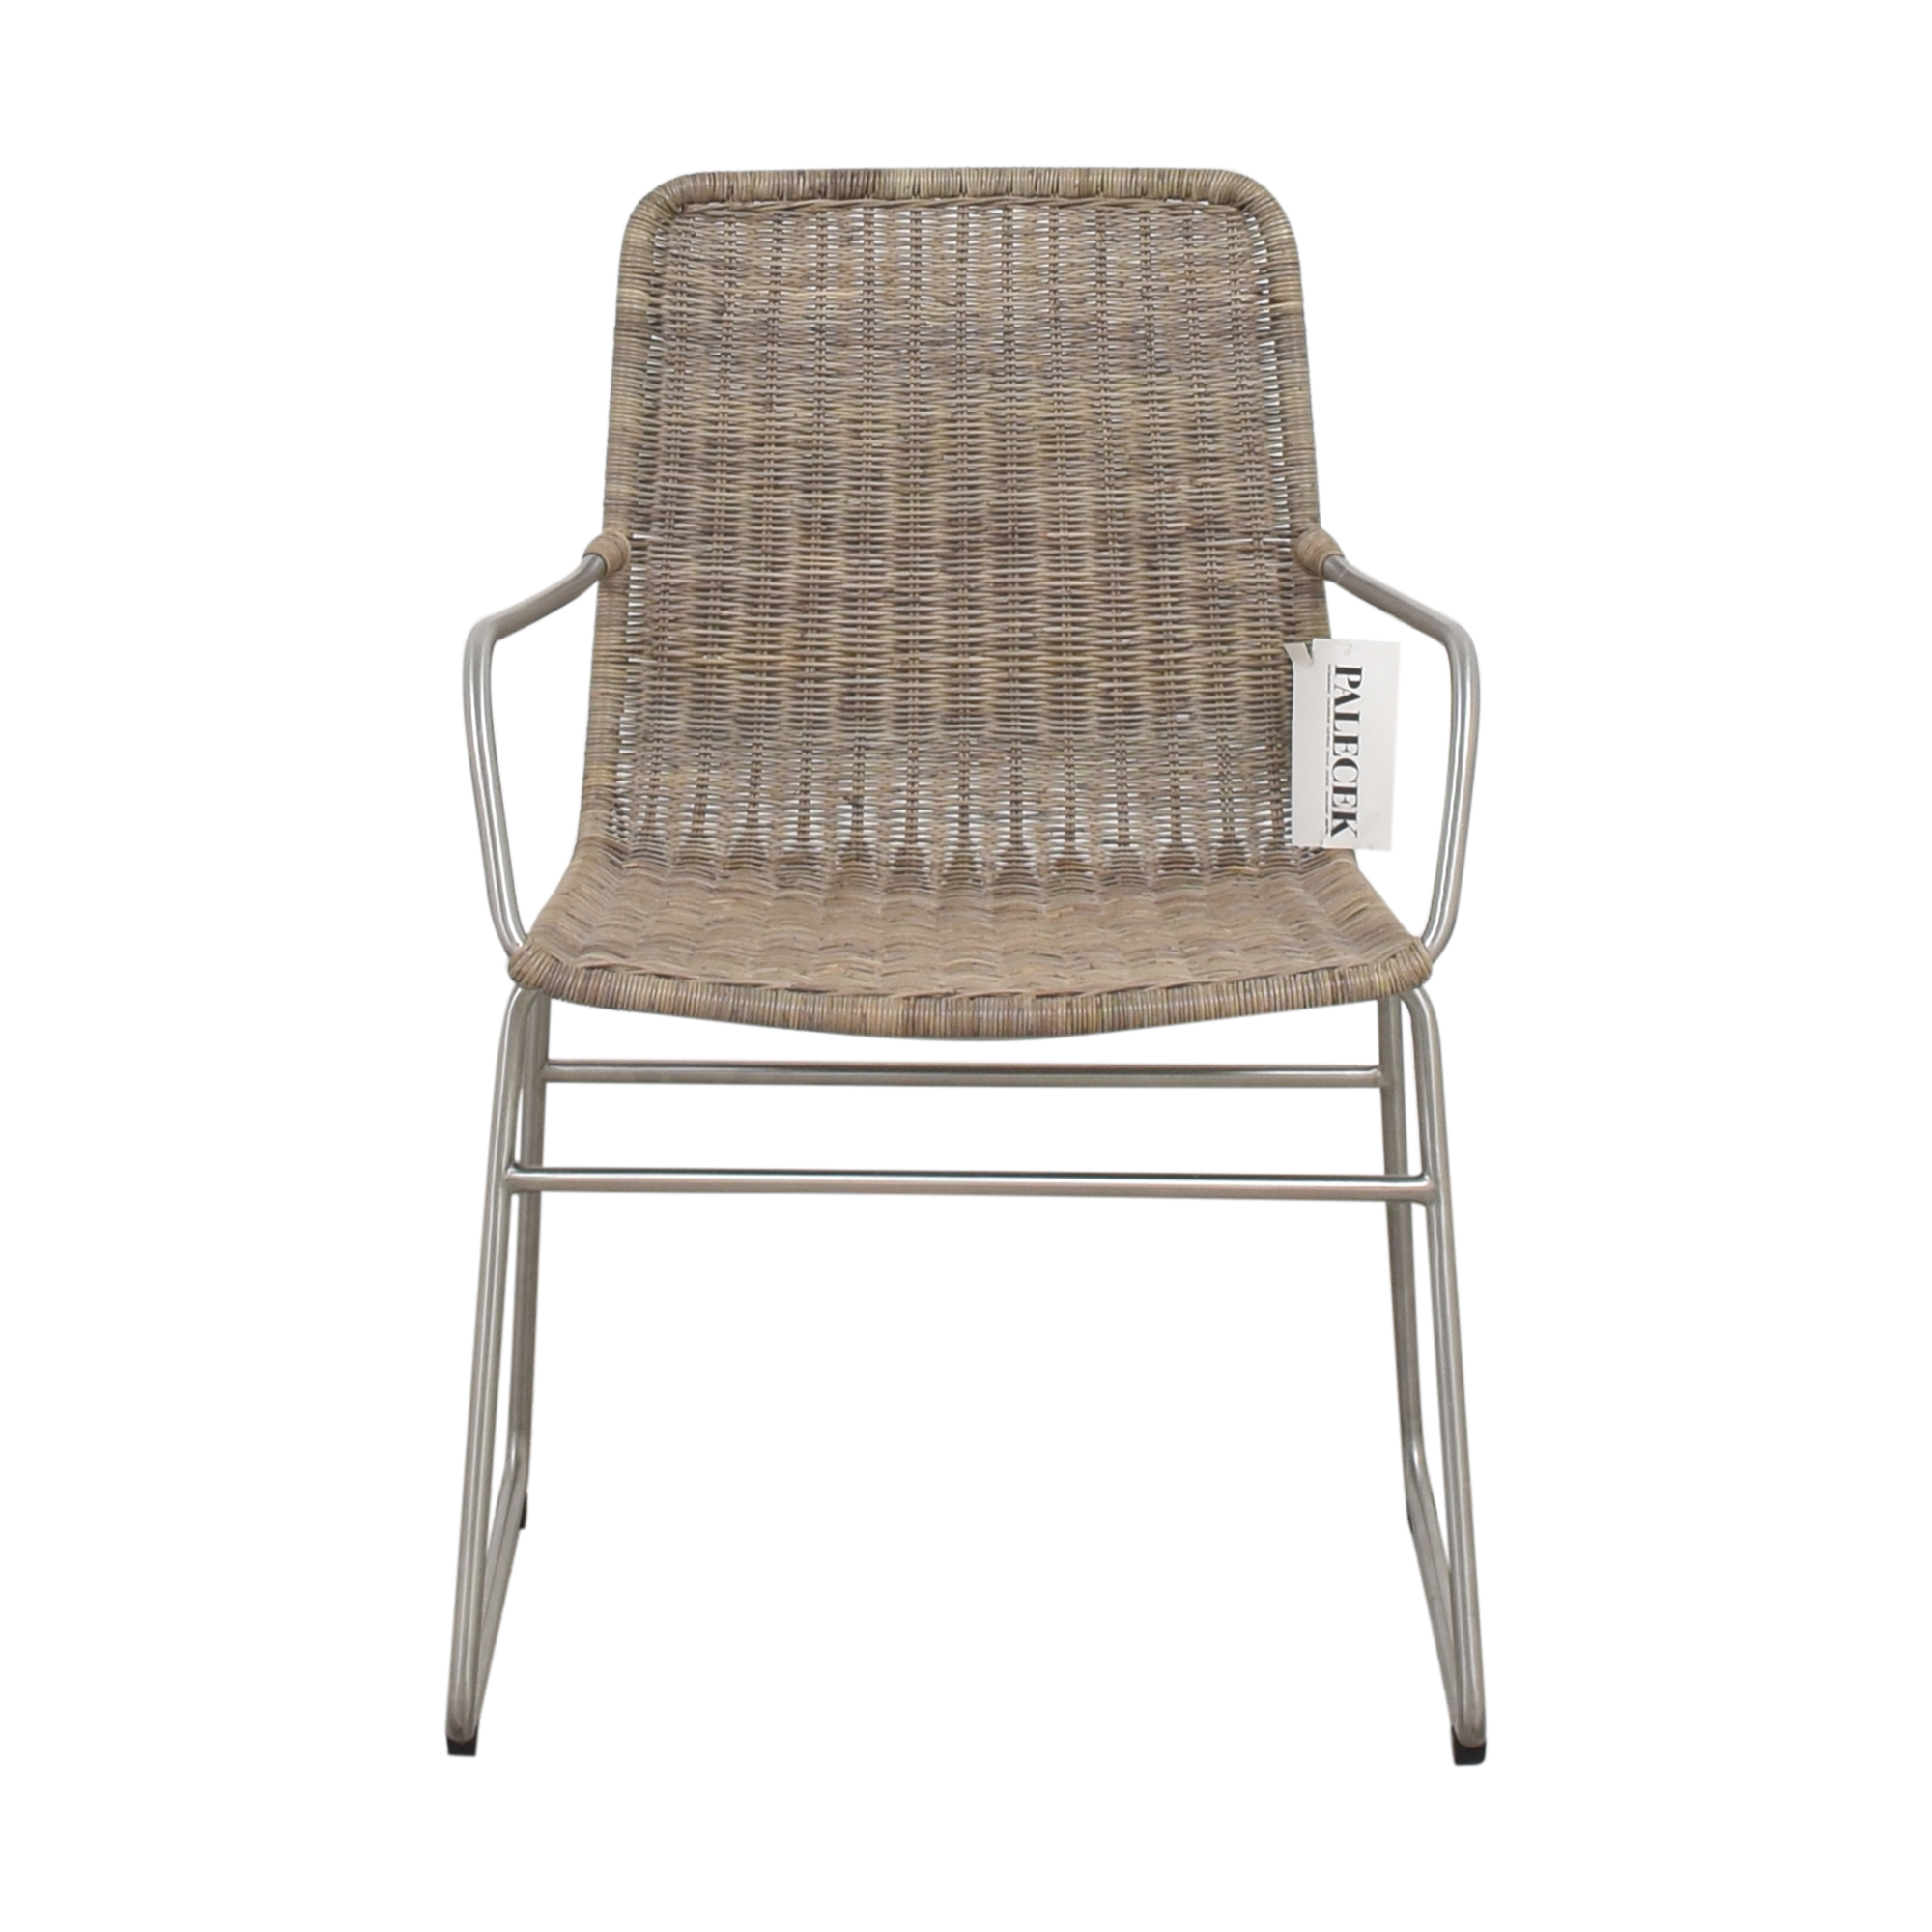 Palecek Palecek Oslo Arm Chair dimensions